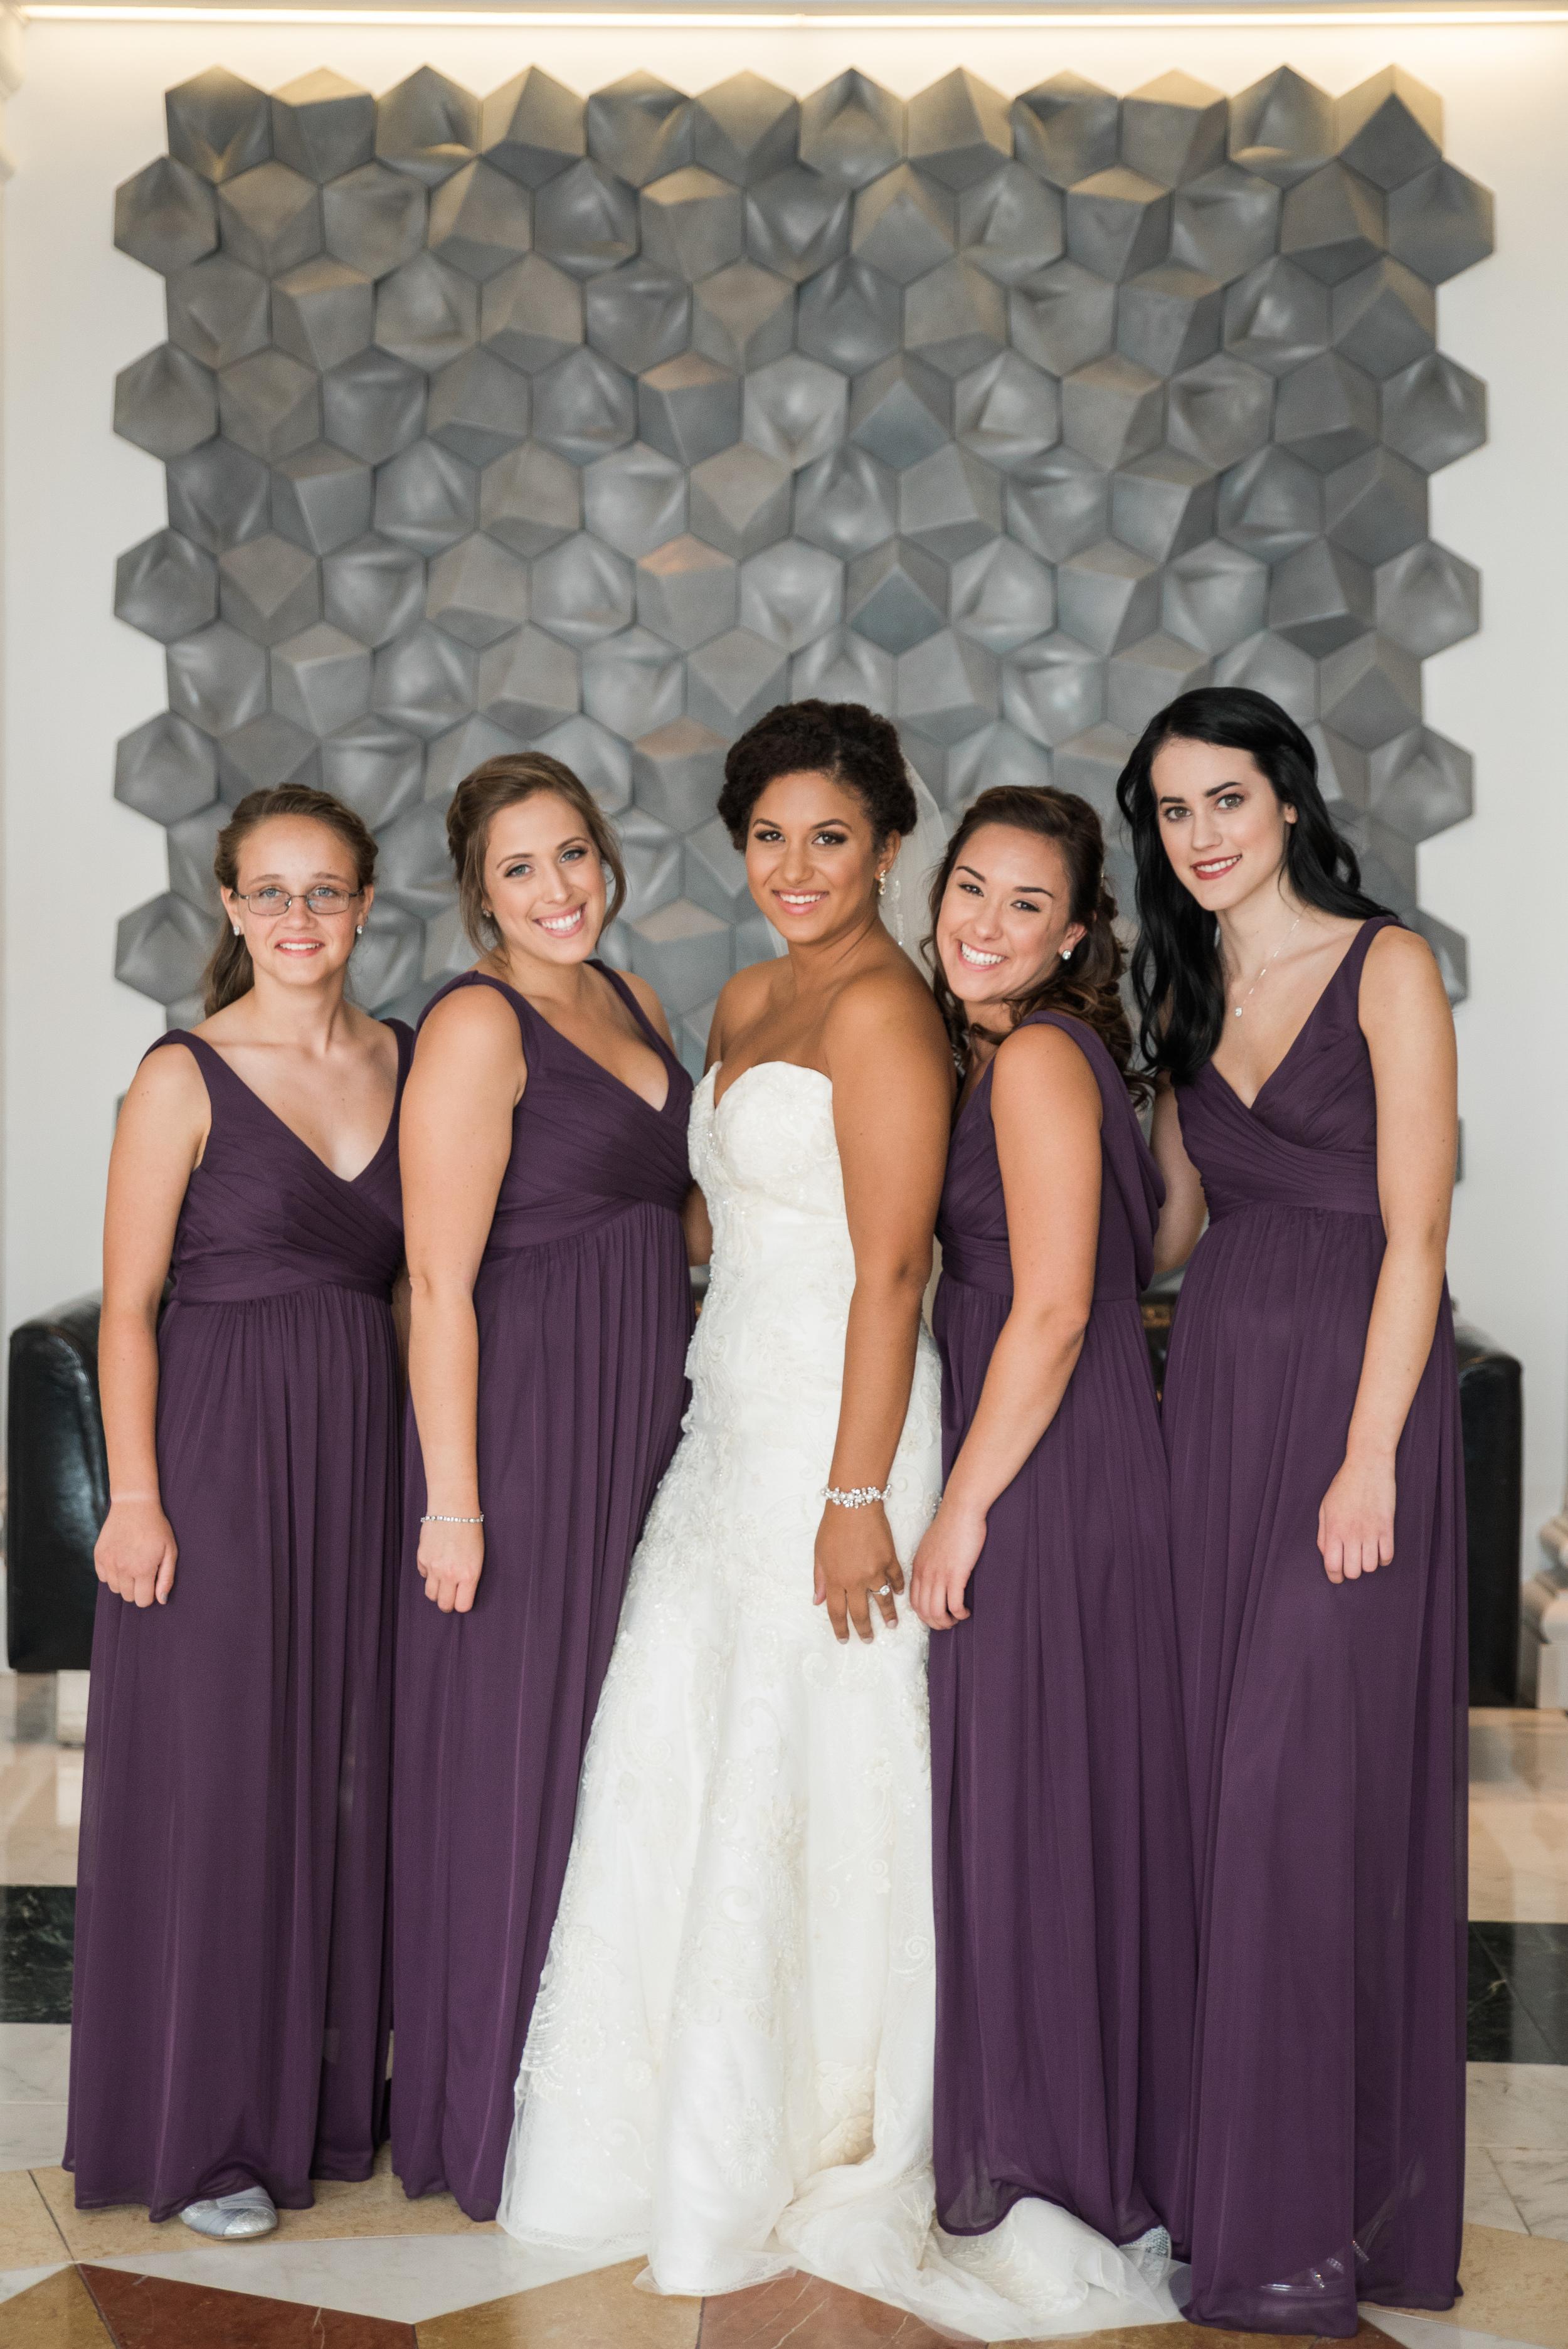 house of lubold photograph weddings-12.jpg